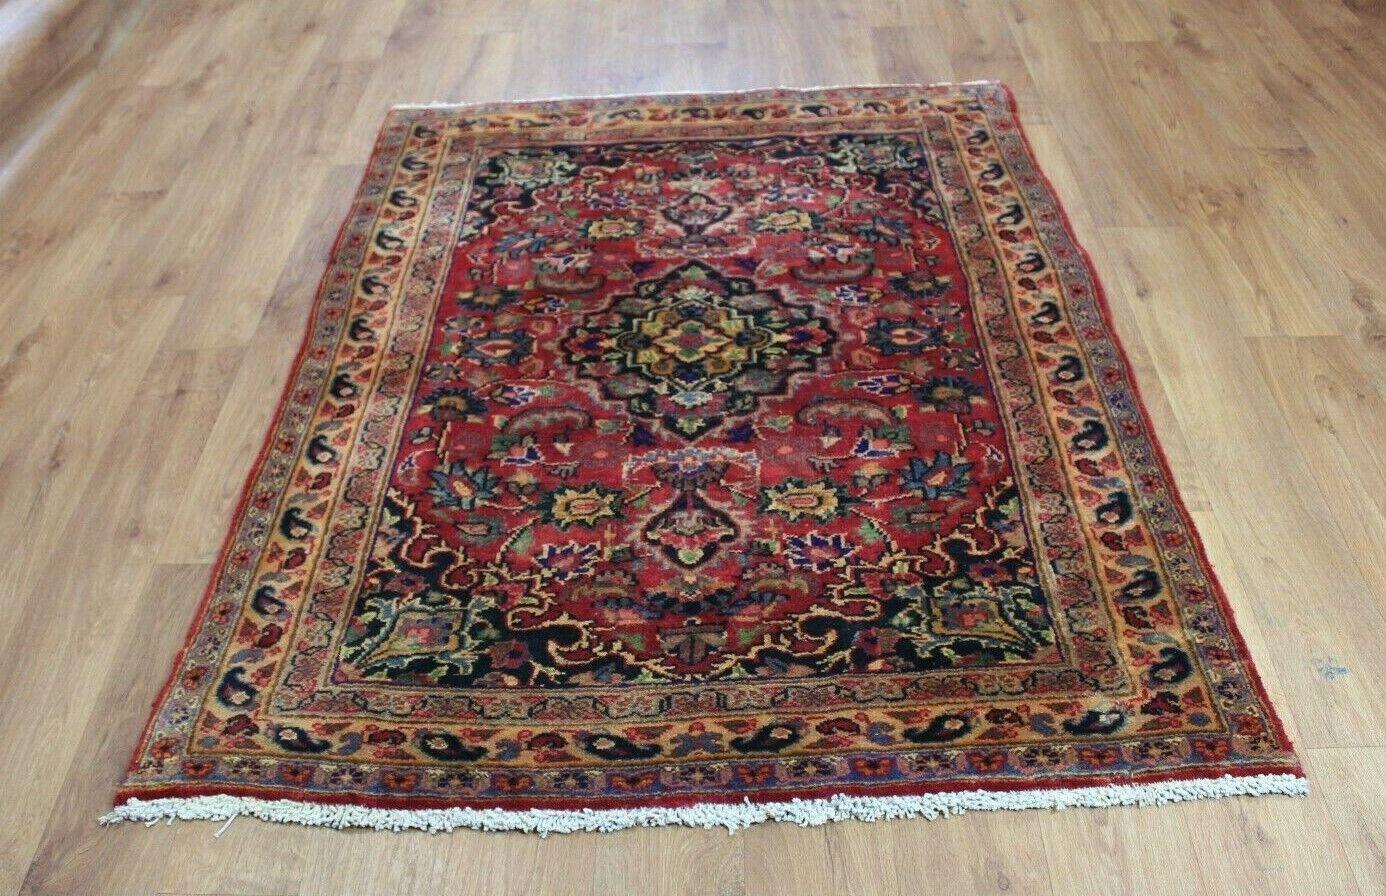 Traditional Vintage Wool Handmade Classic Oriental Area Rug Carpet Carpet Carpet 155X 116 cm c1c15c